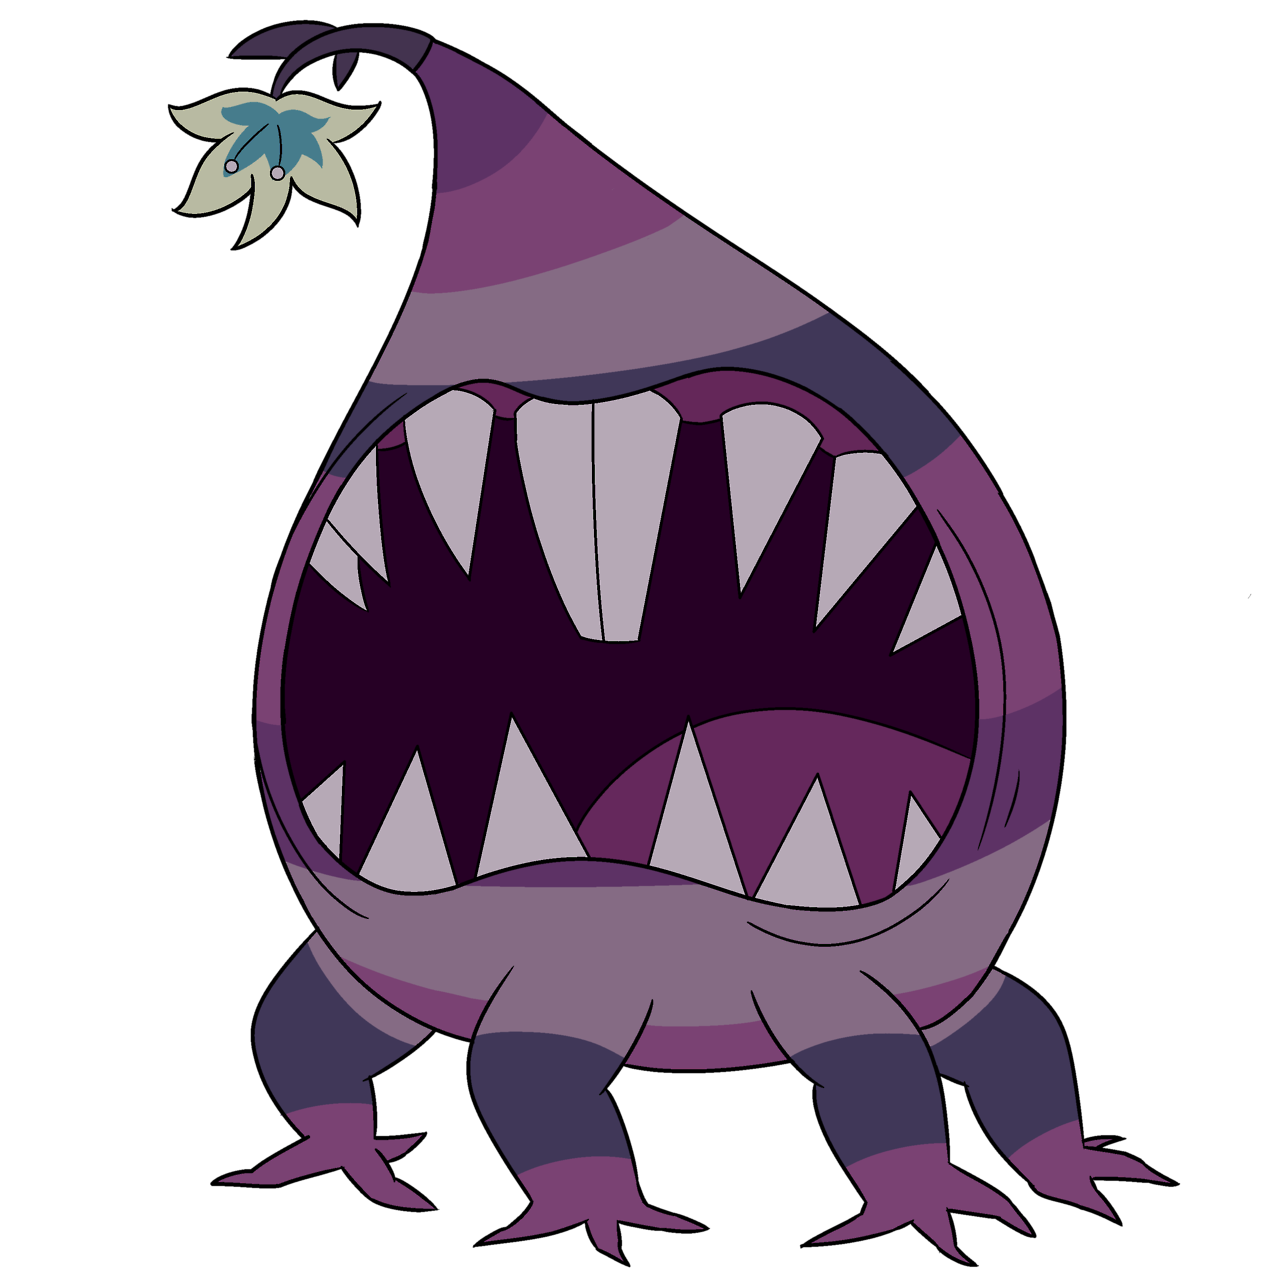 Grossular Diopside